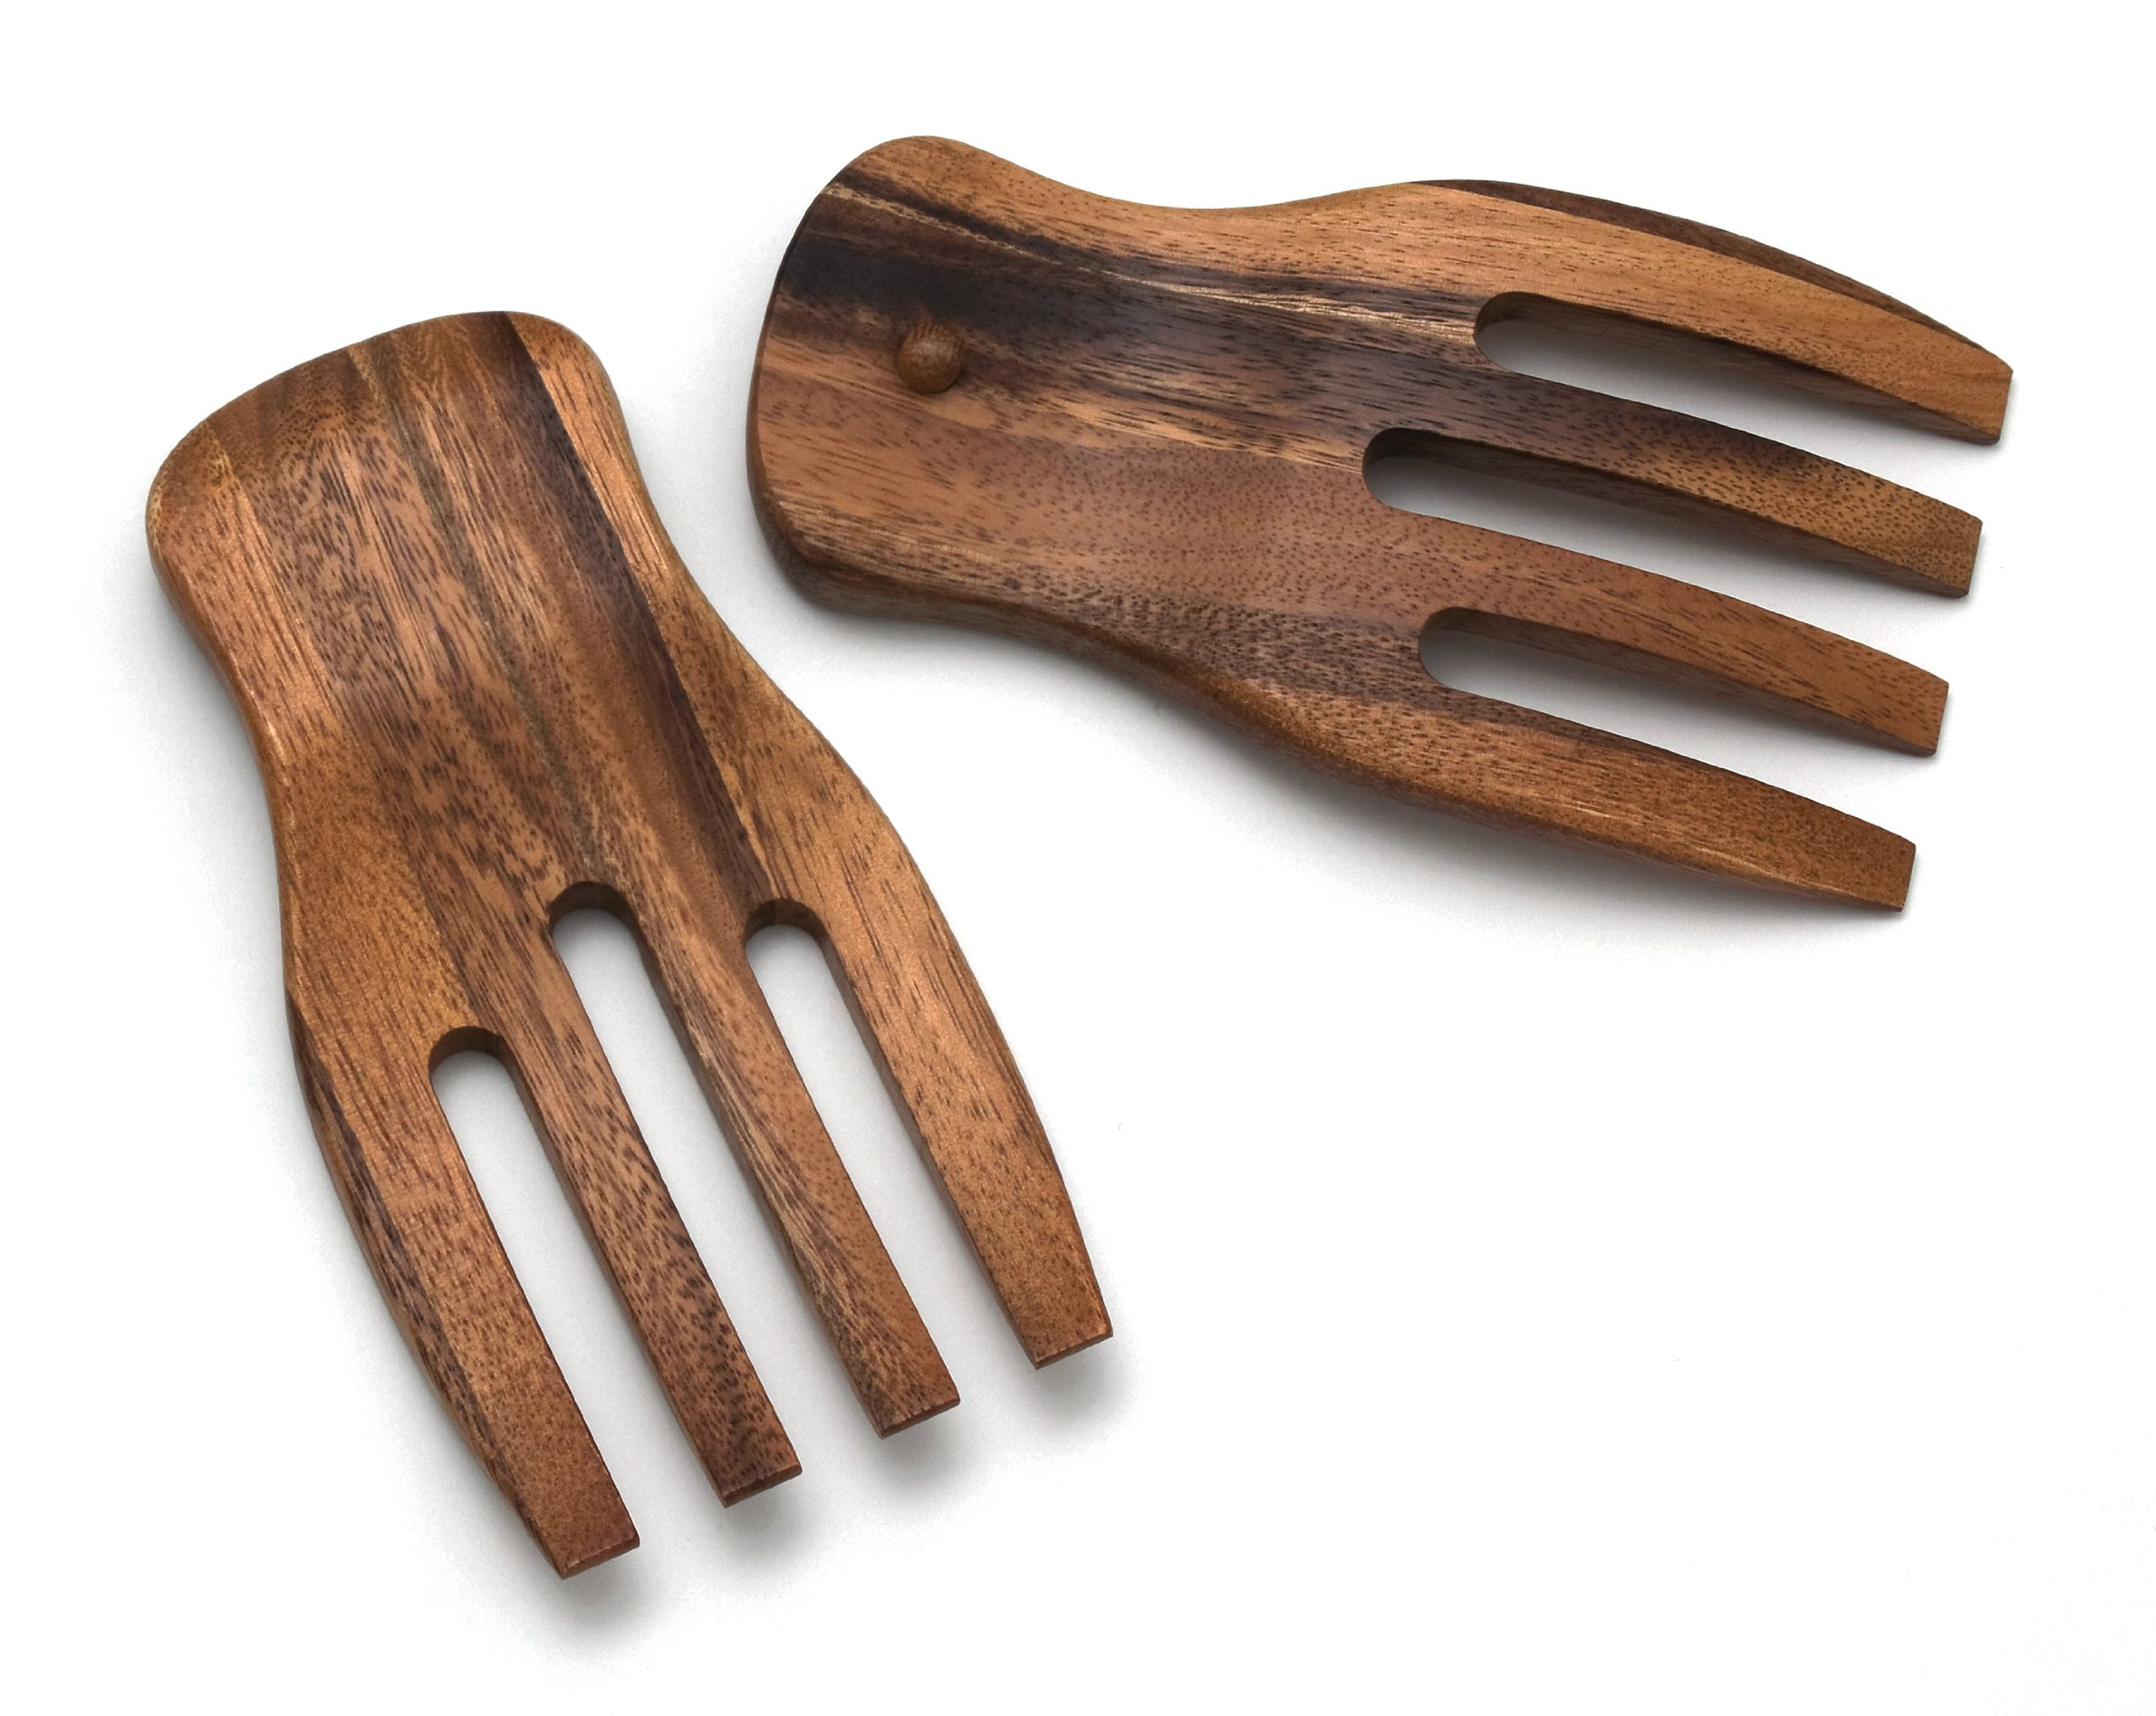 Lipper International 1102 Acacia Salad Hands, 3.75'' x 7'' x 1.88'', One Pair